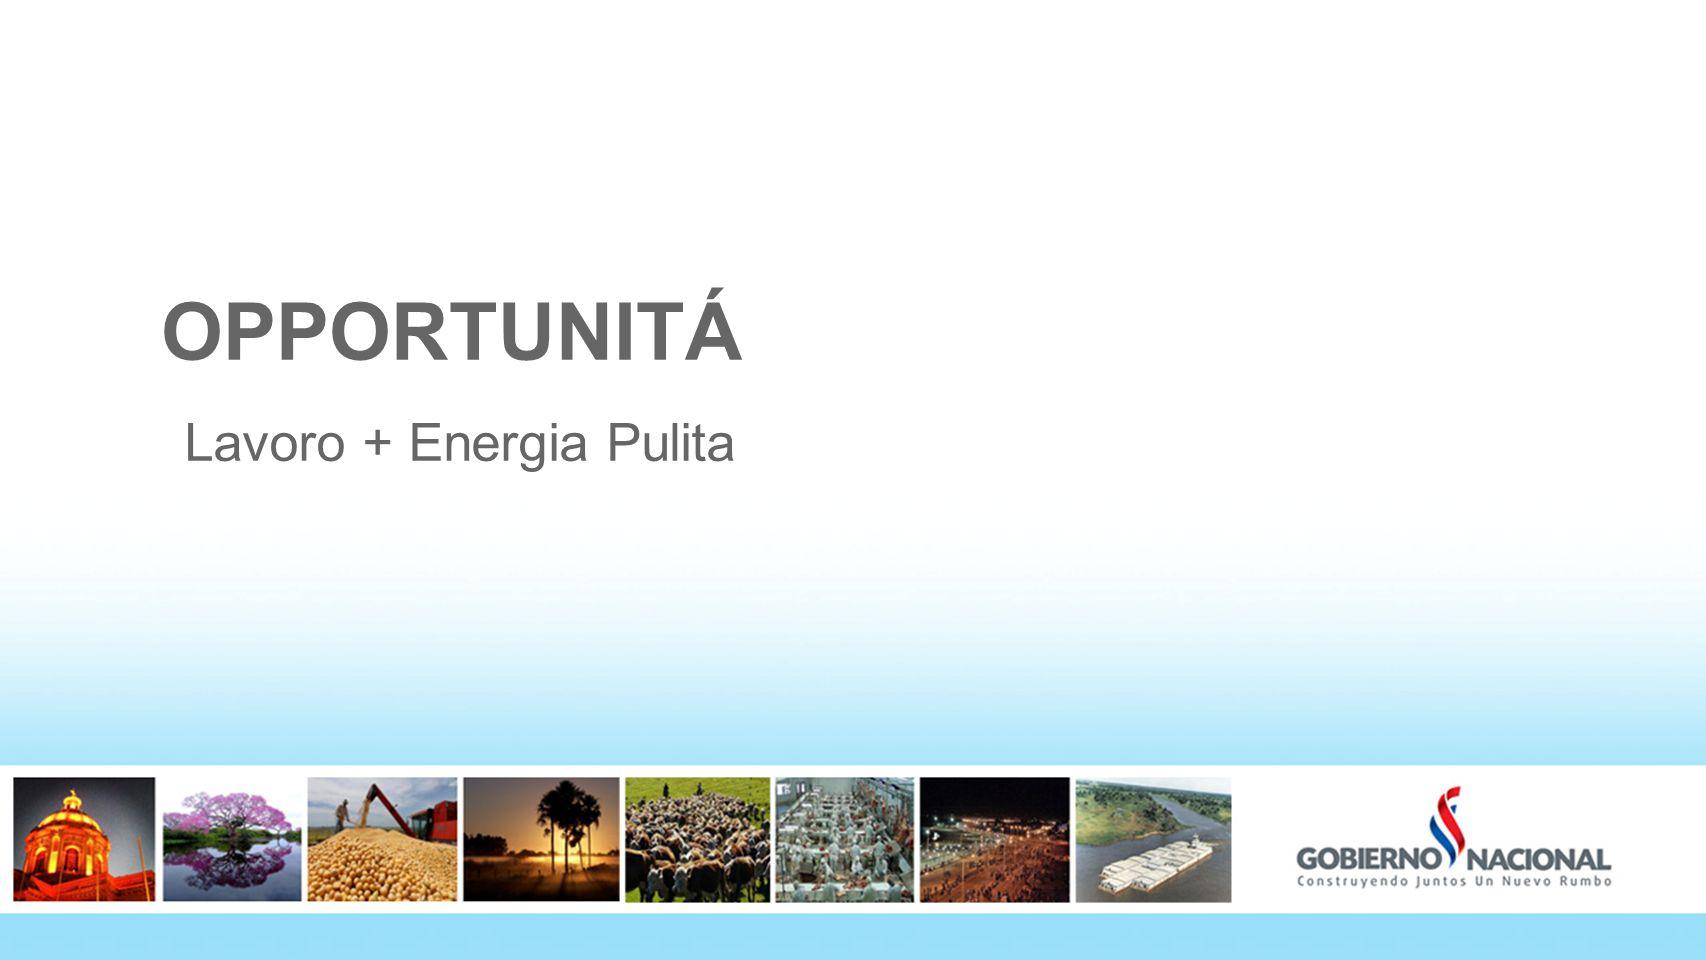 1414 OPPORTUNITÁ Lavoro + Energia Pulita 14